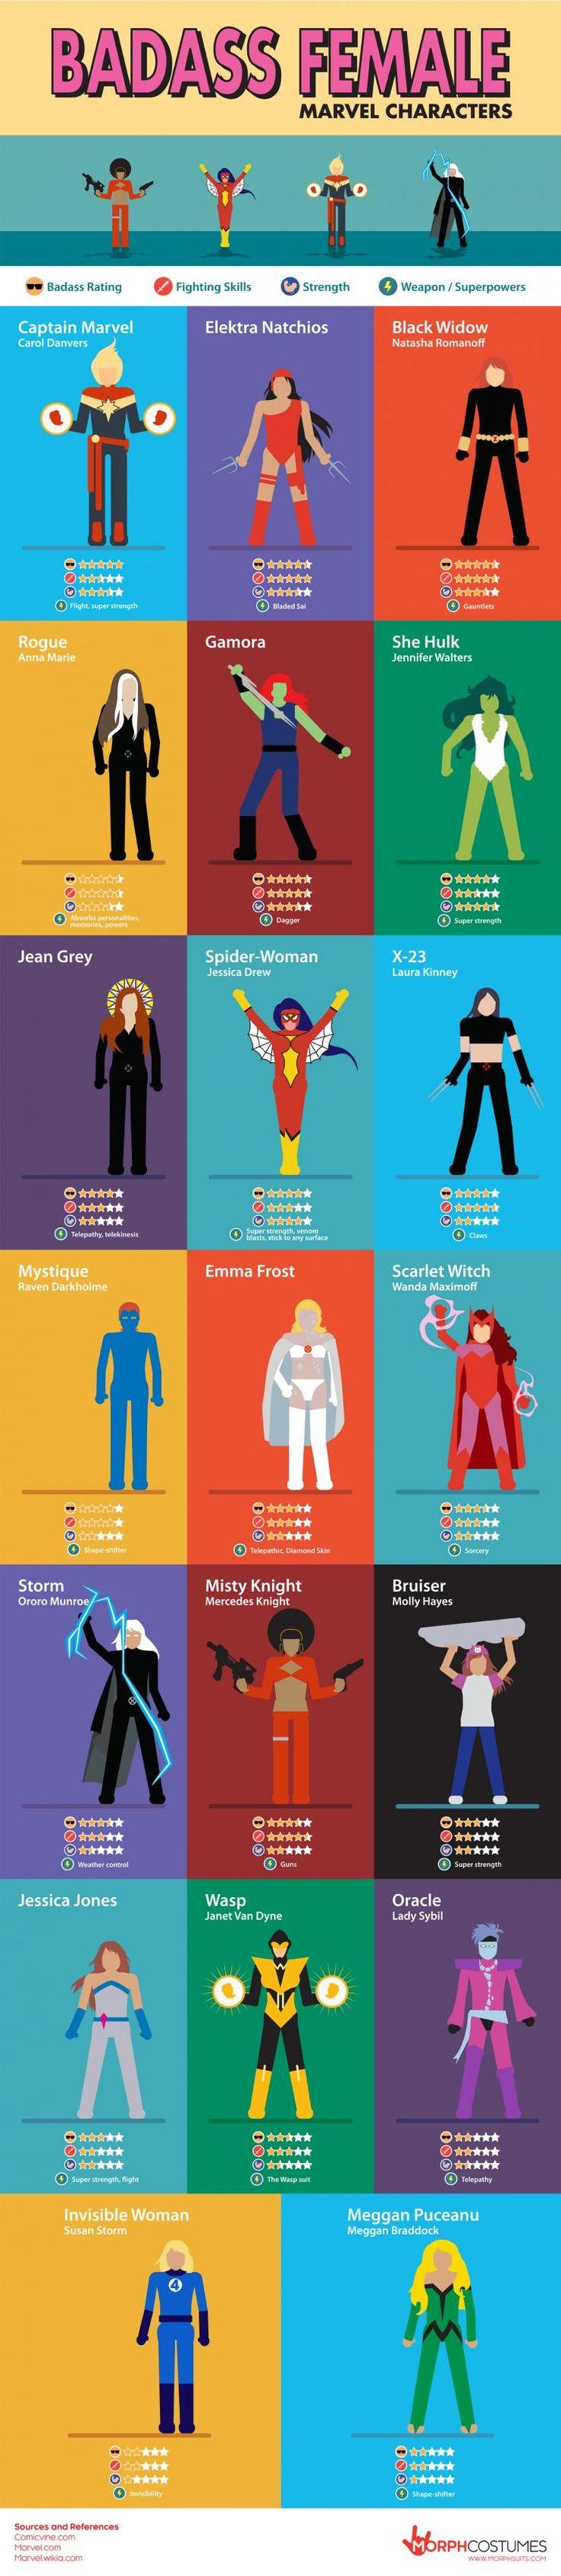 Badass Female Marvel Characters